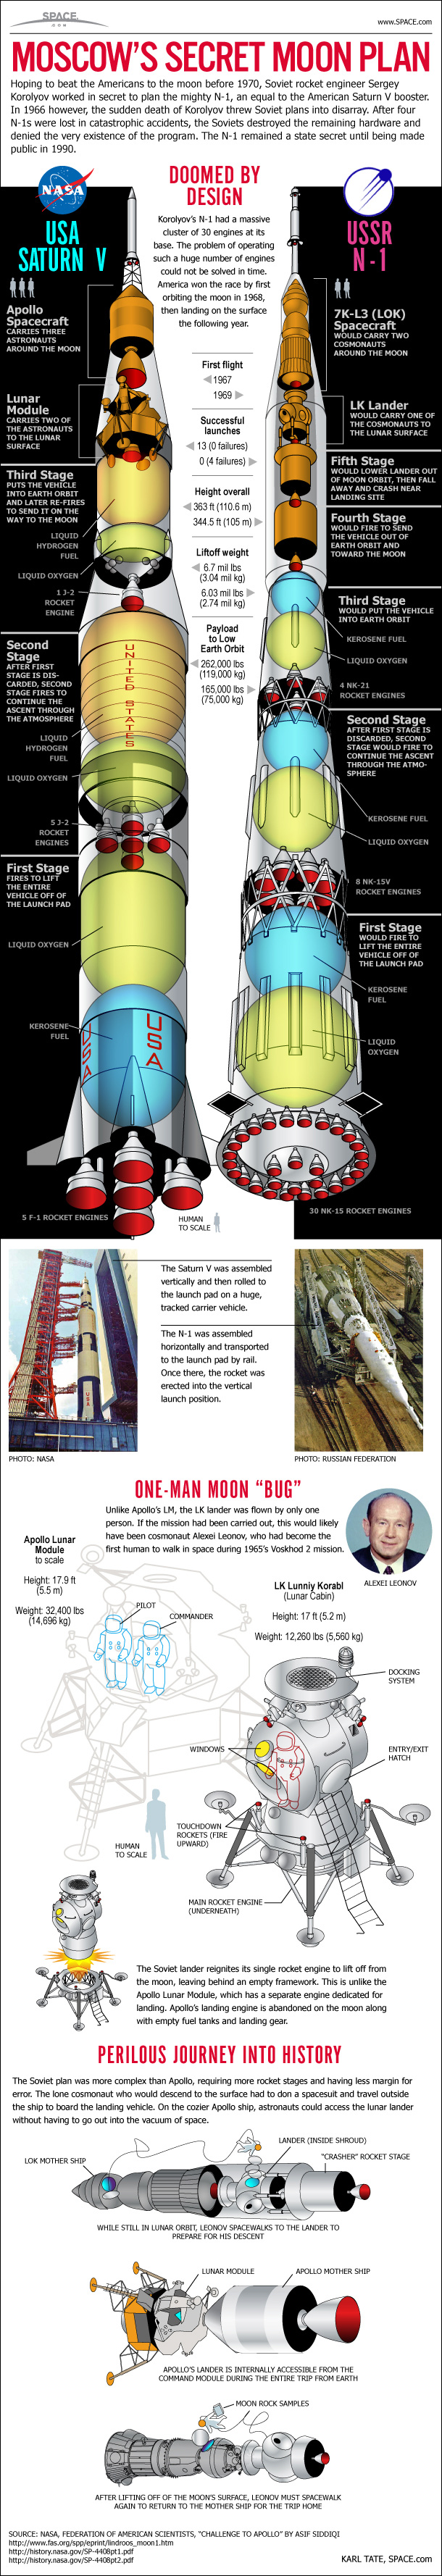 Moscow's Secret Moon Plan - The N-1 Rocket